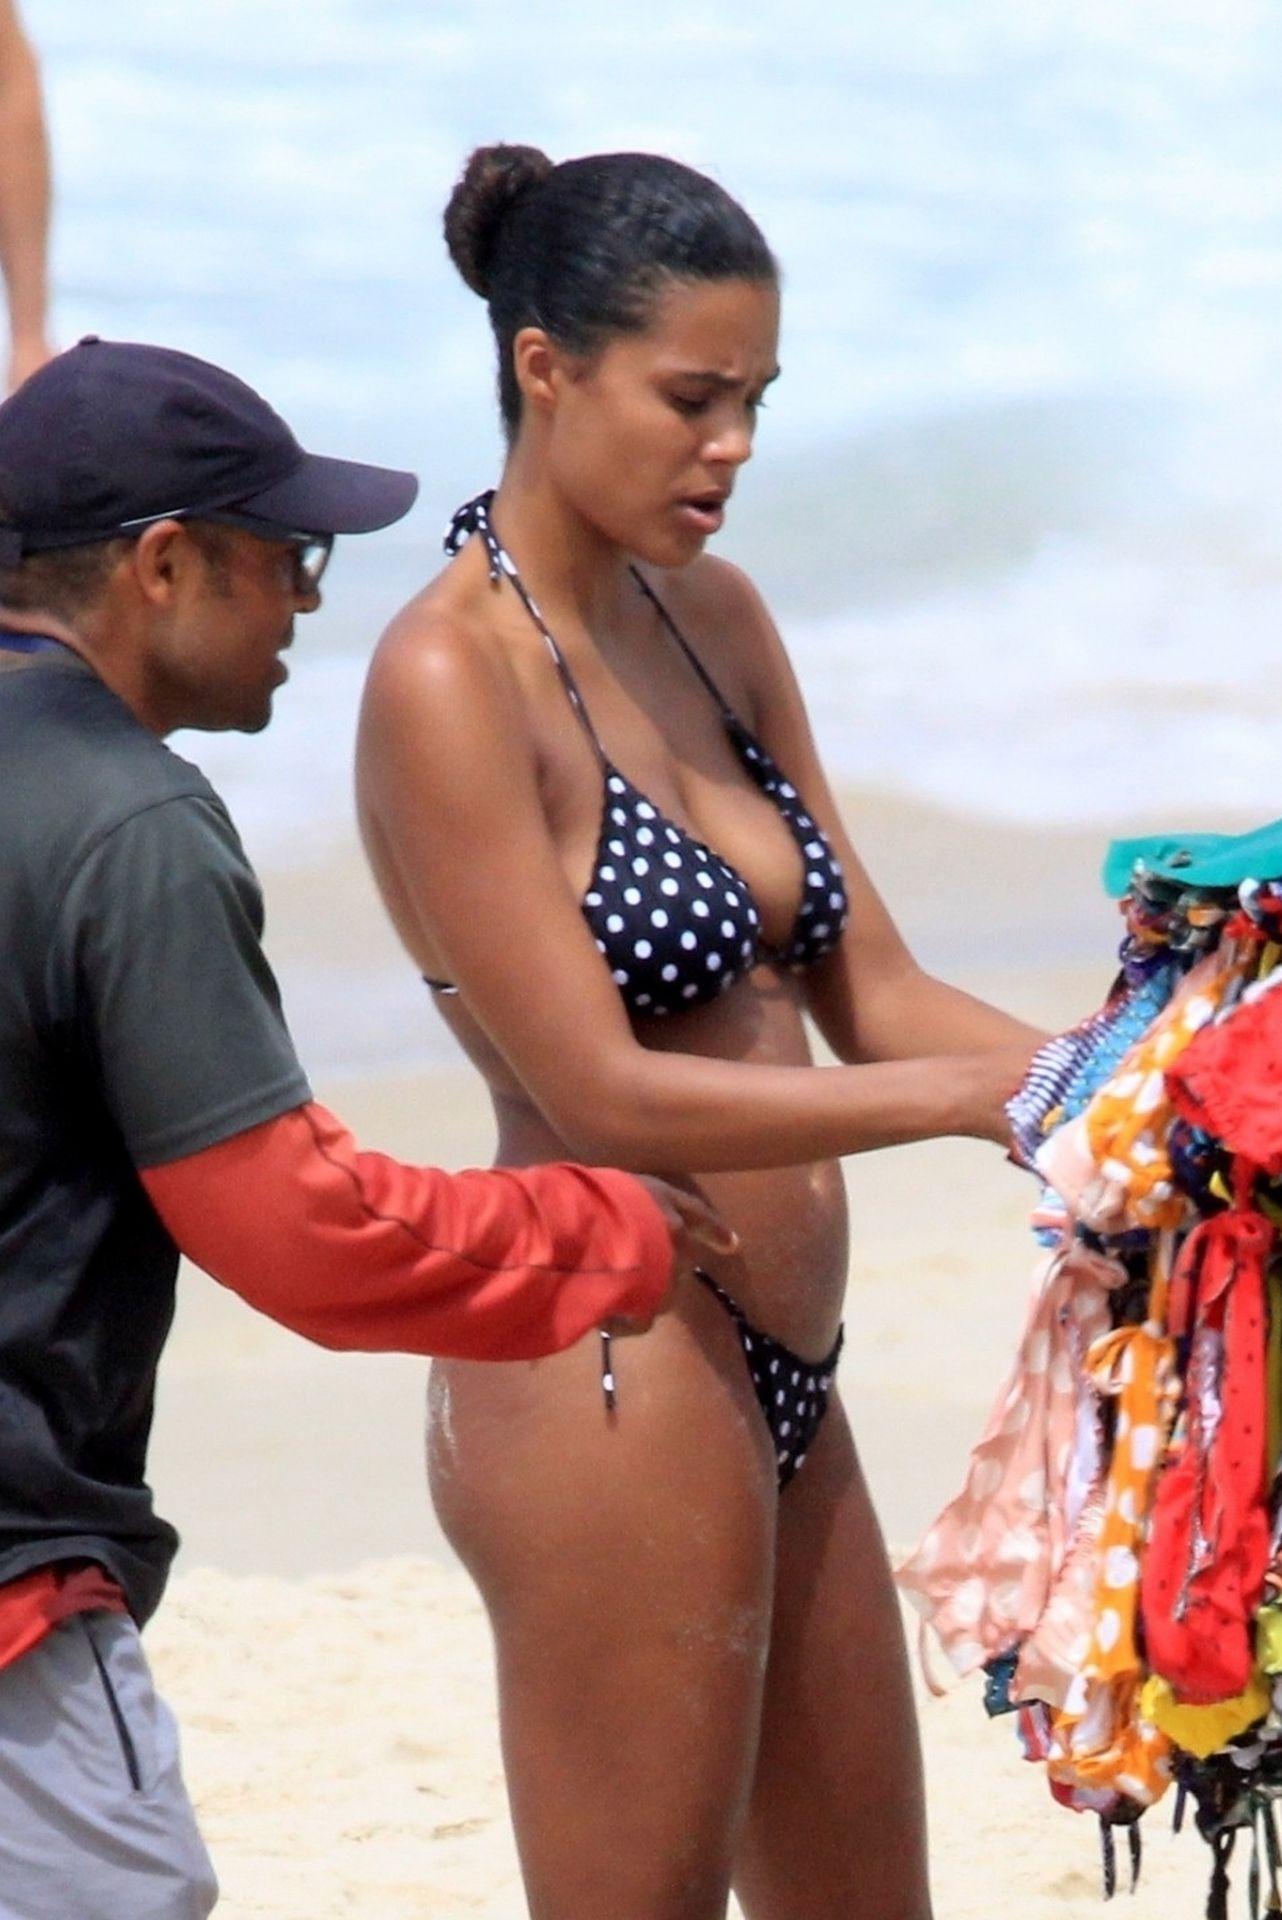 Tina Kunakey Nearly Nip Slip While Frolicking On The Beach In Rio 0014